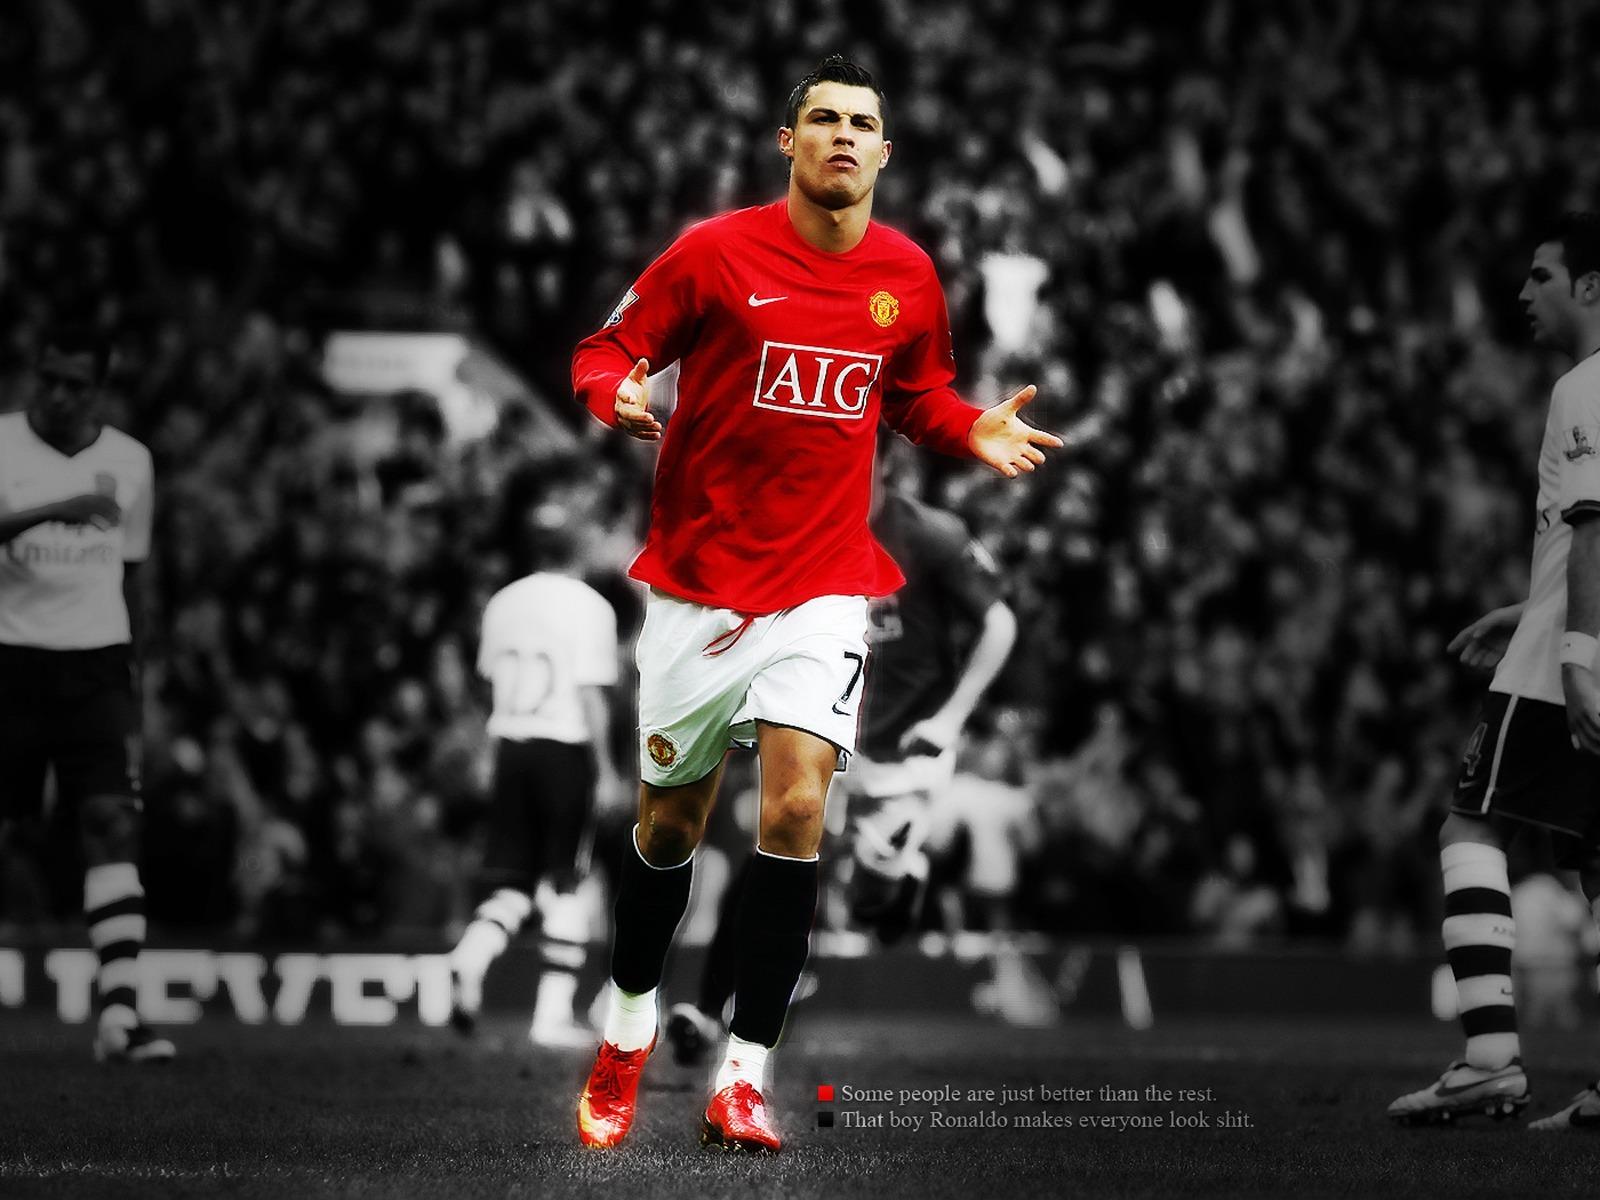 cristiano ronaldo wallpaper football sports wallpapers in jpg format